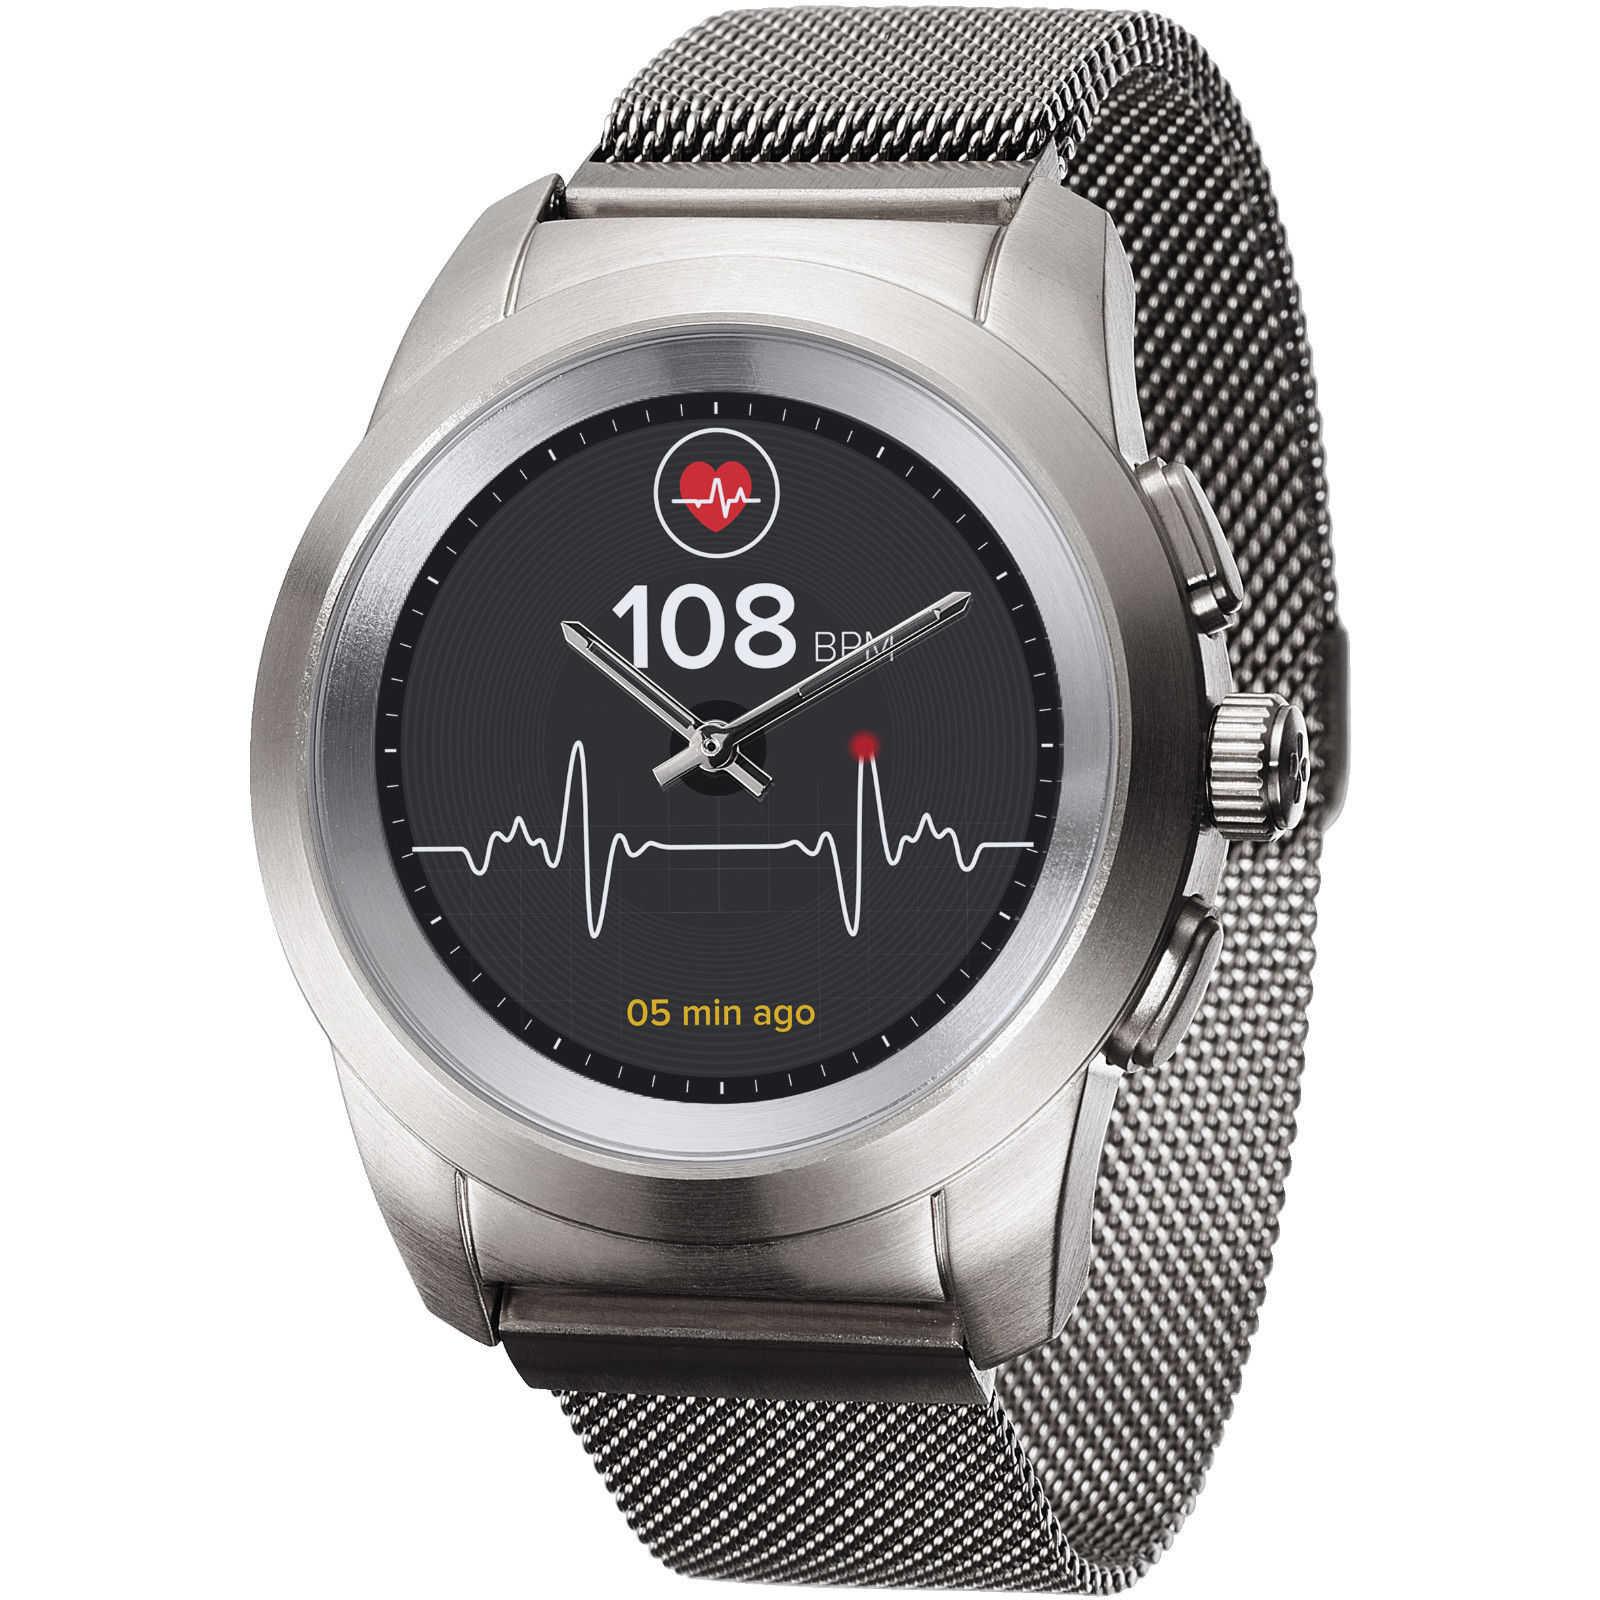 mykronoz zetime regular elite smartwatch fuer 189 e inkl versand statt 239e